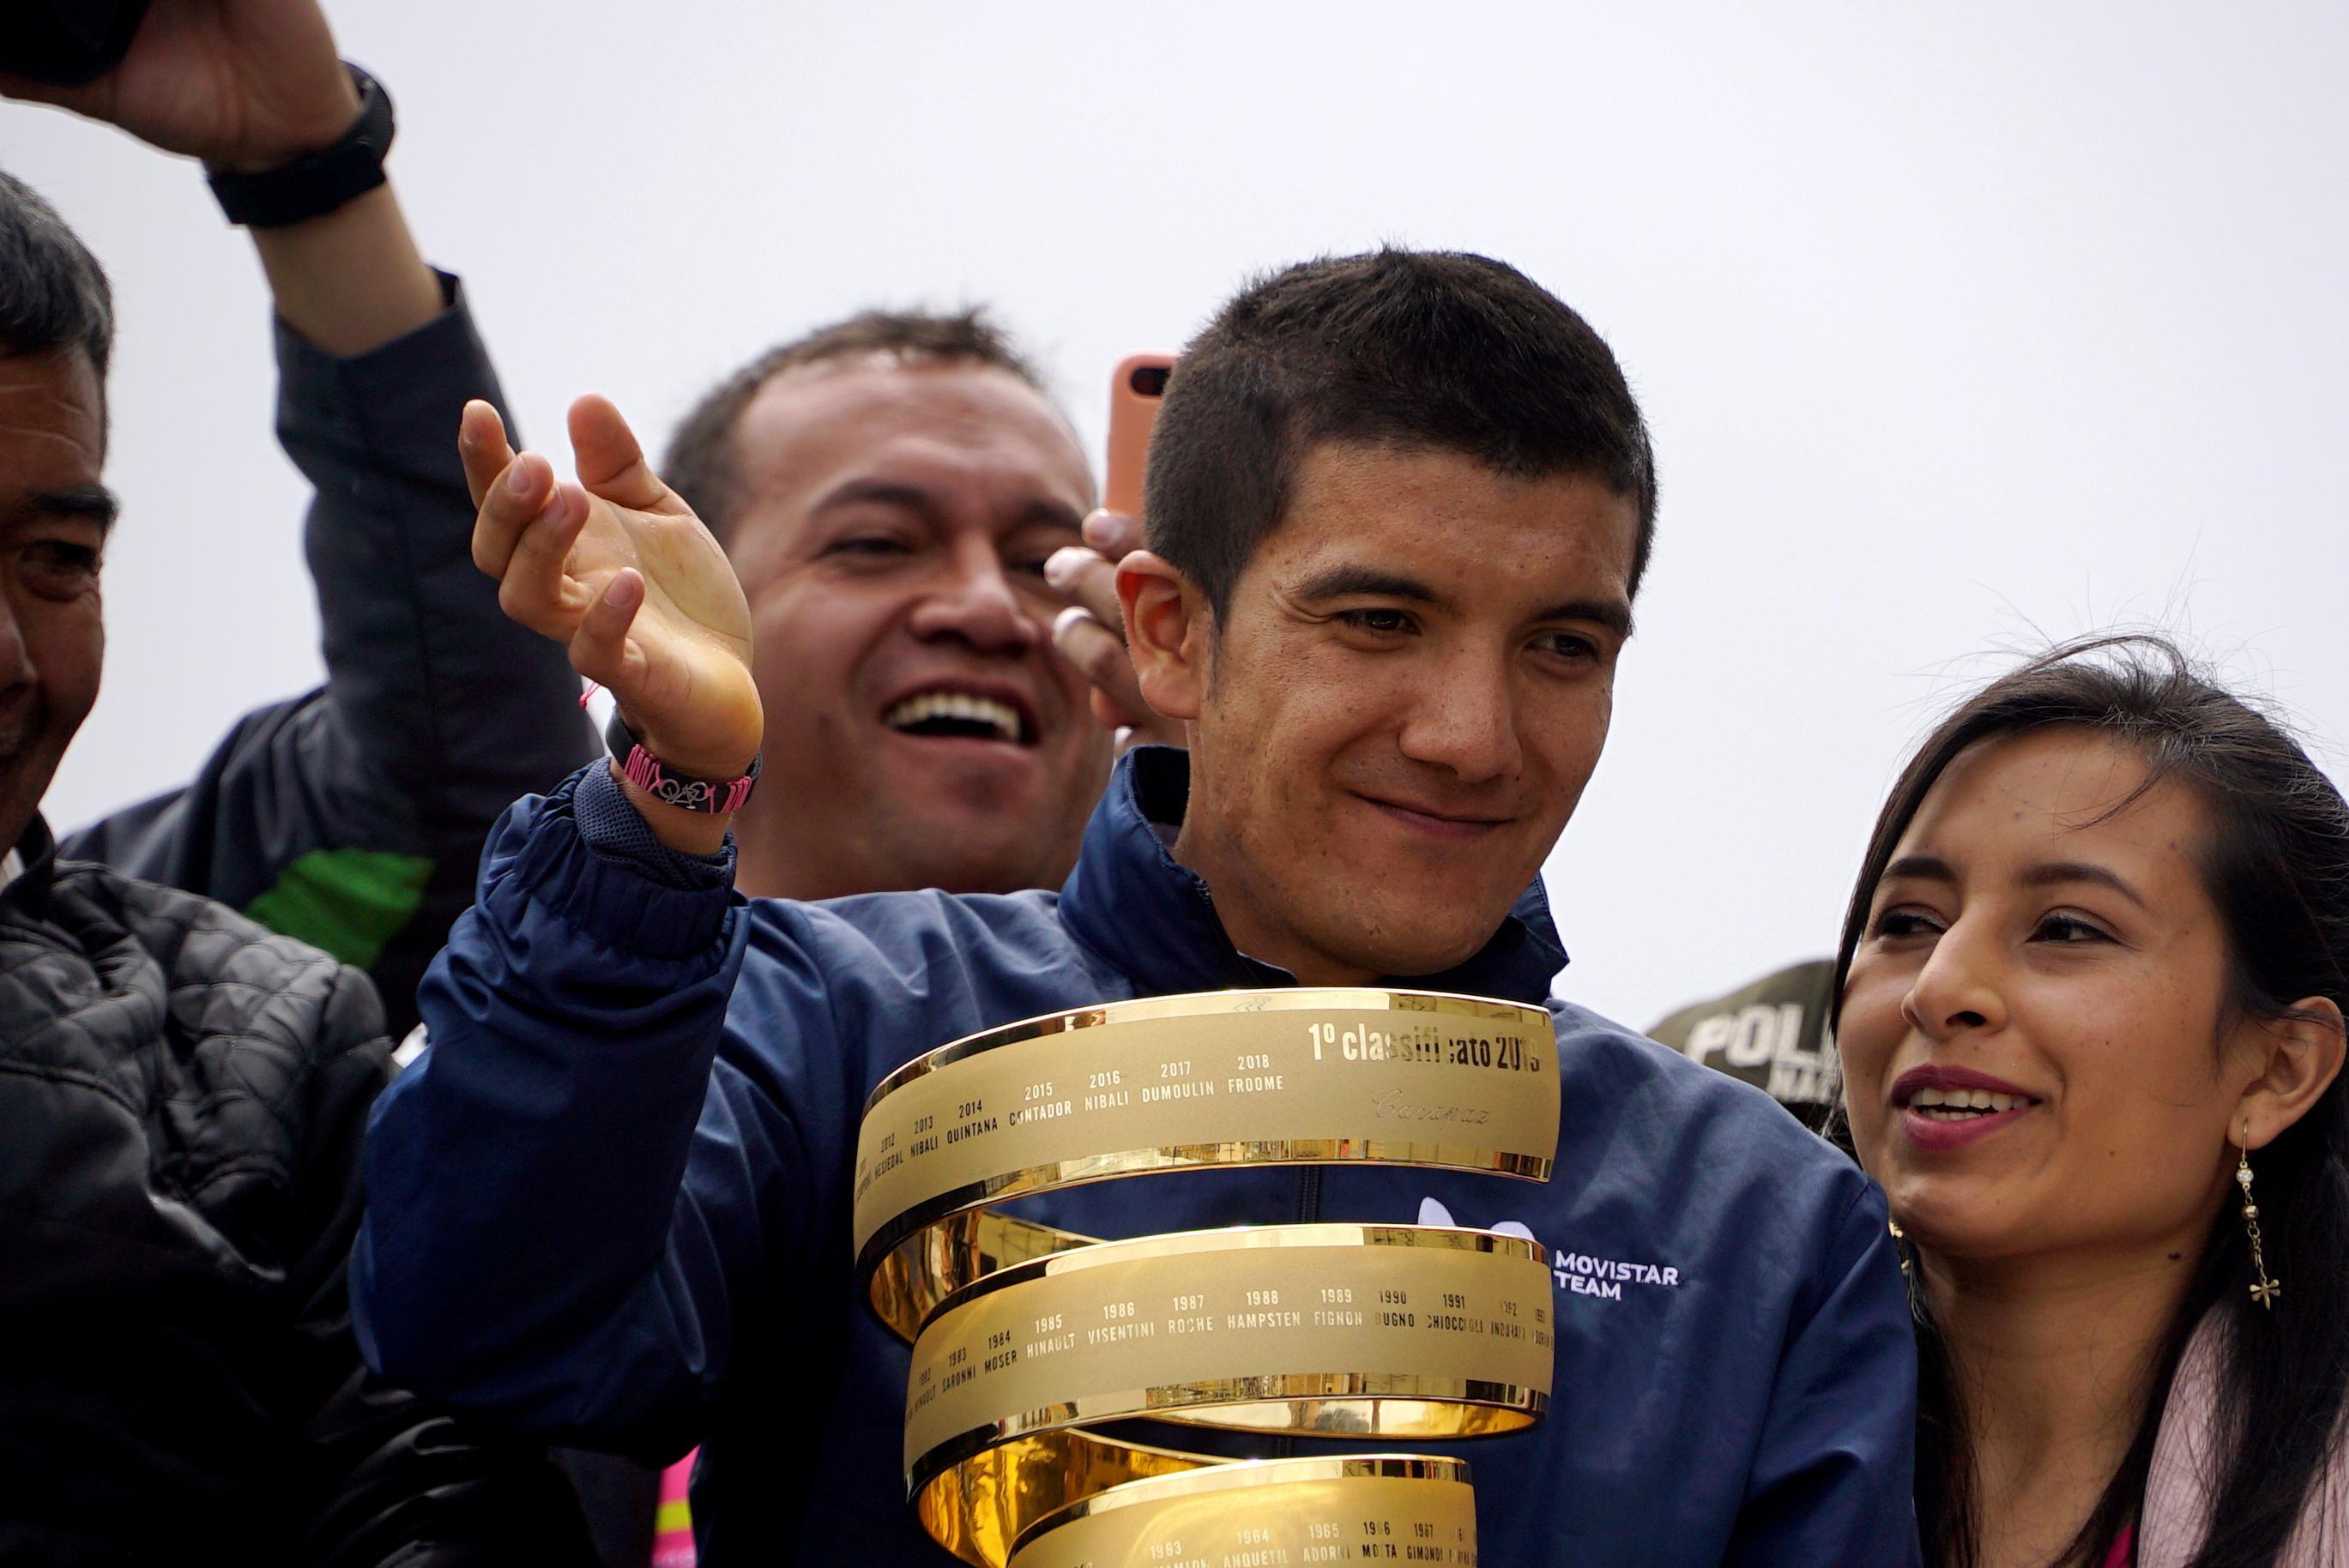 Cycling: Giro champion Carapaz joins Team Ineos